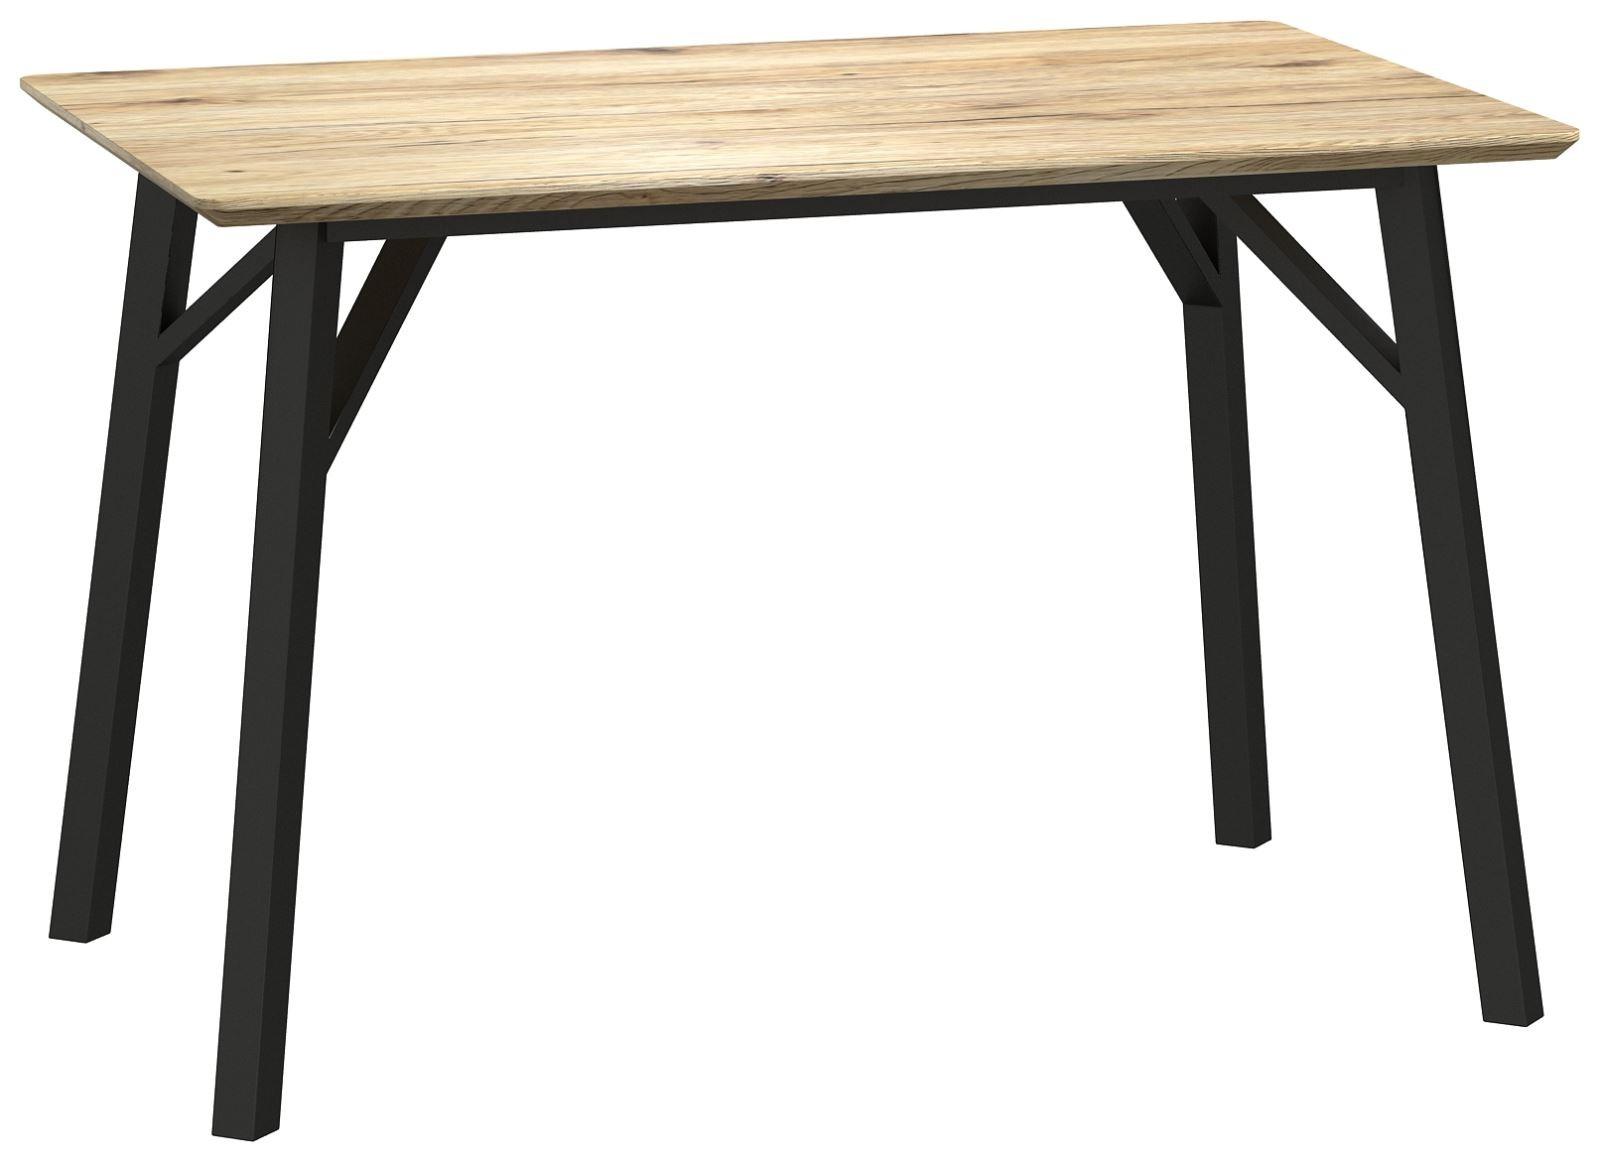 TORONTO LIGHT Rectangular Dining Table